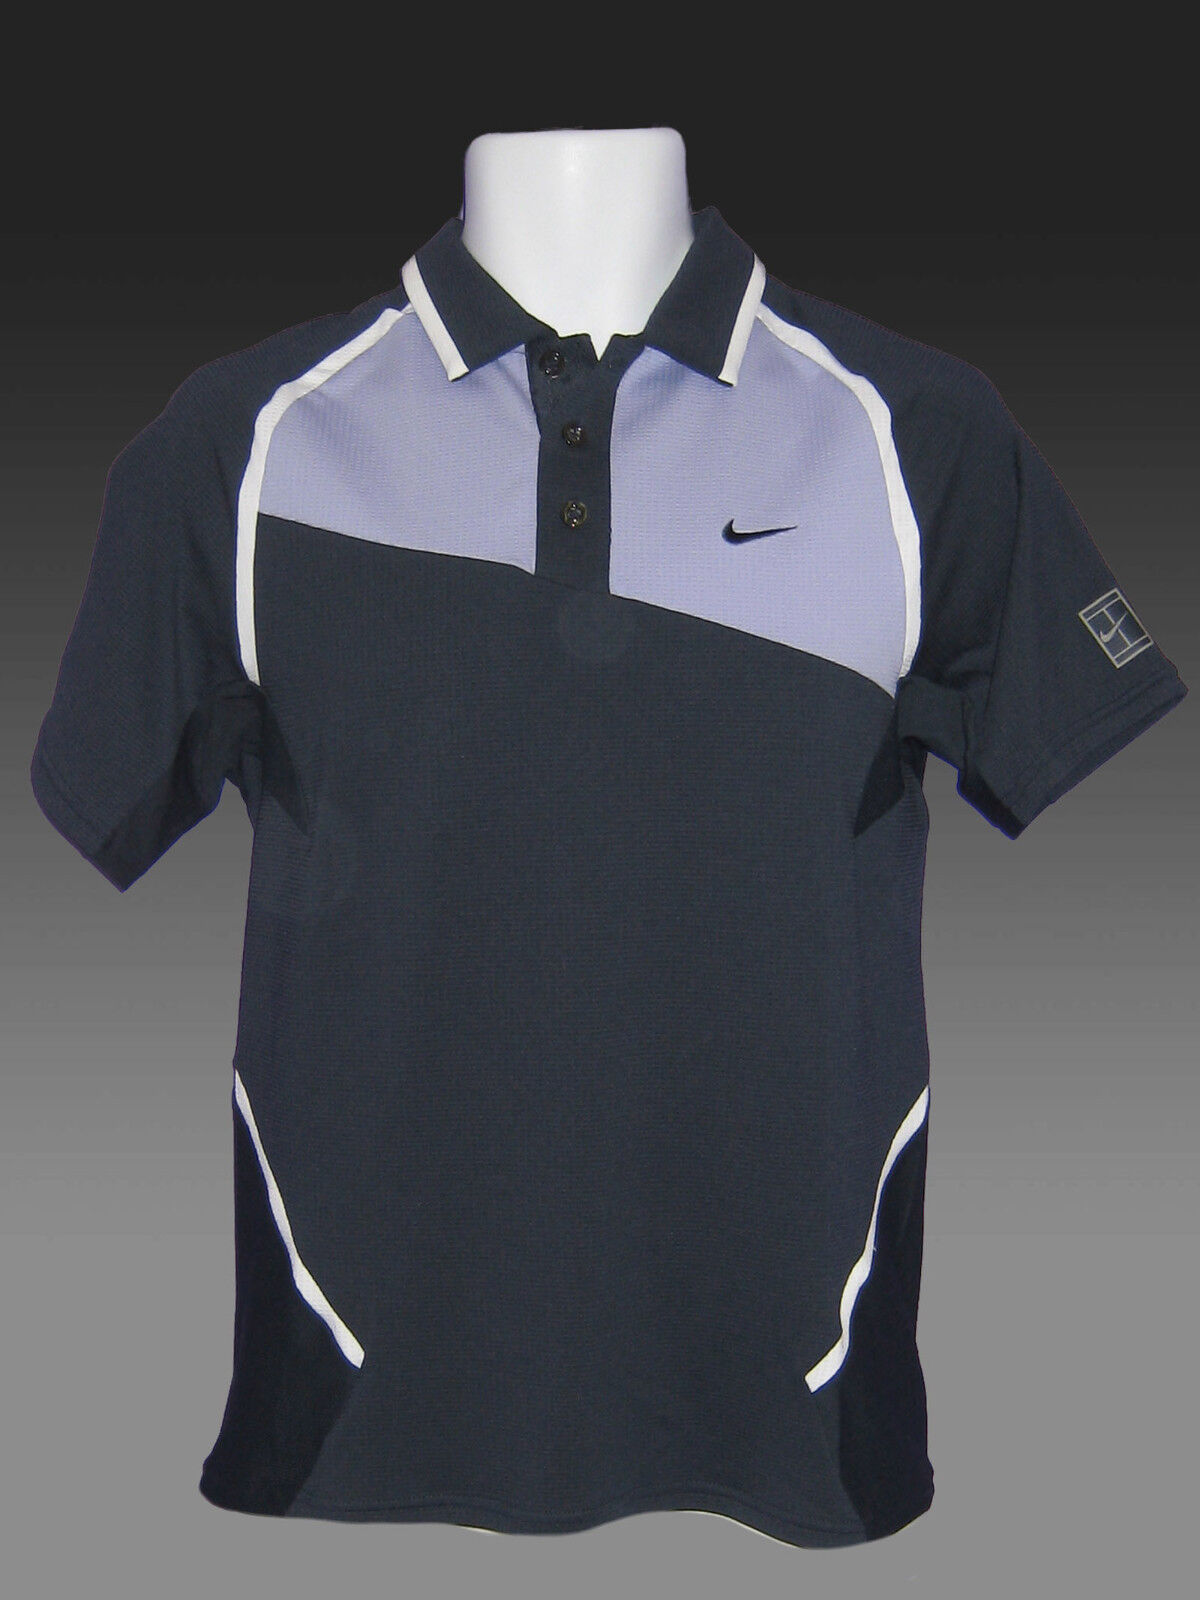 Nuovo Nike Tennis Drifit Maglia Polo Blu Scuro Lavanda M